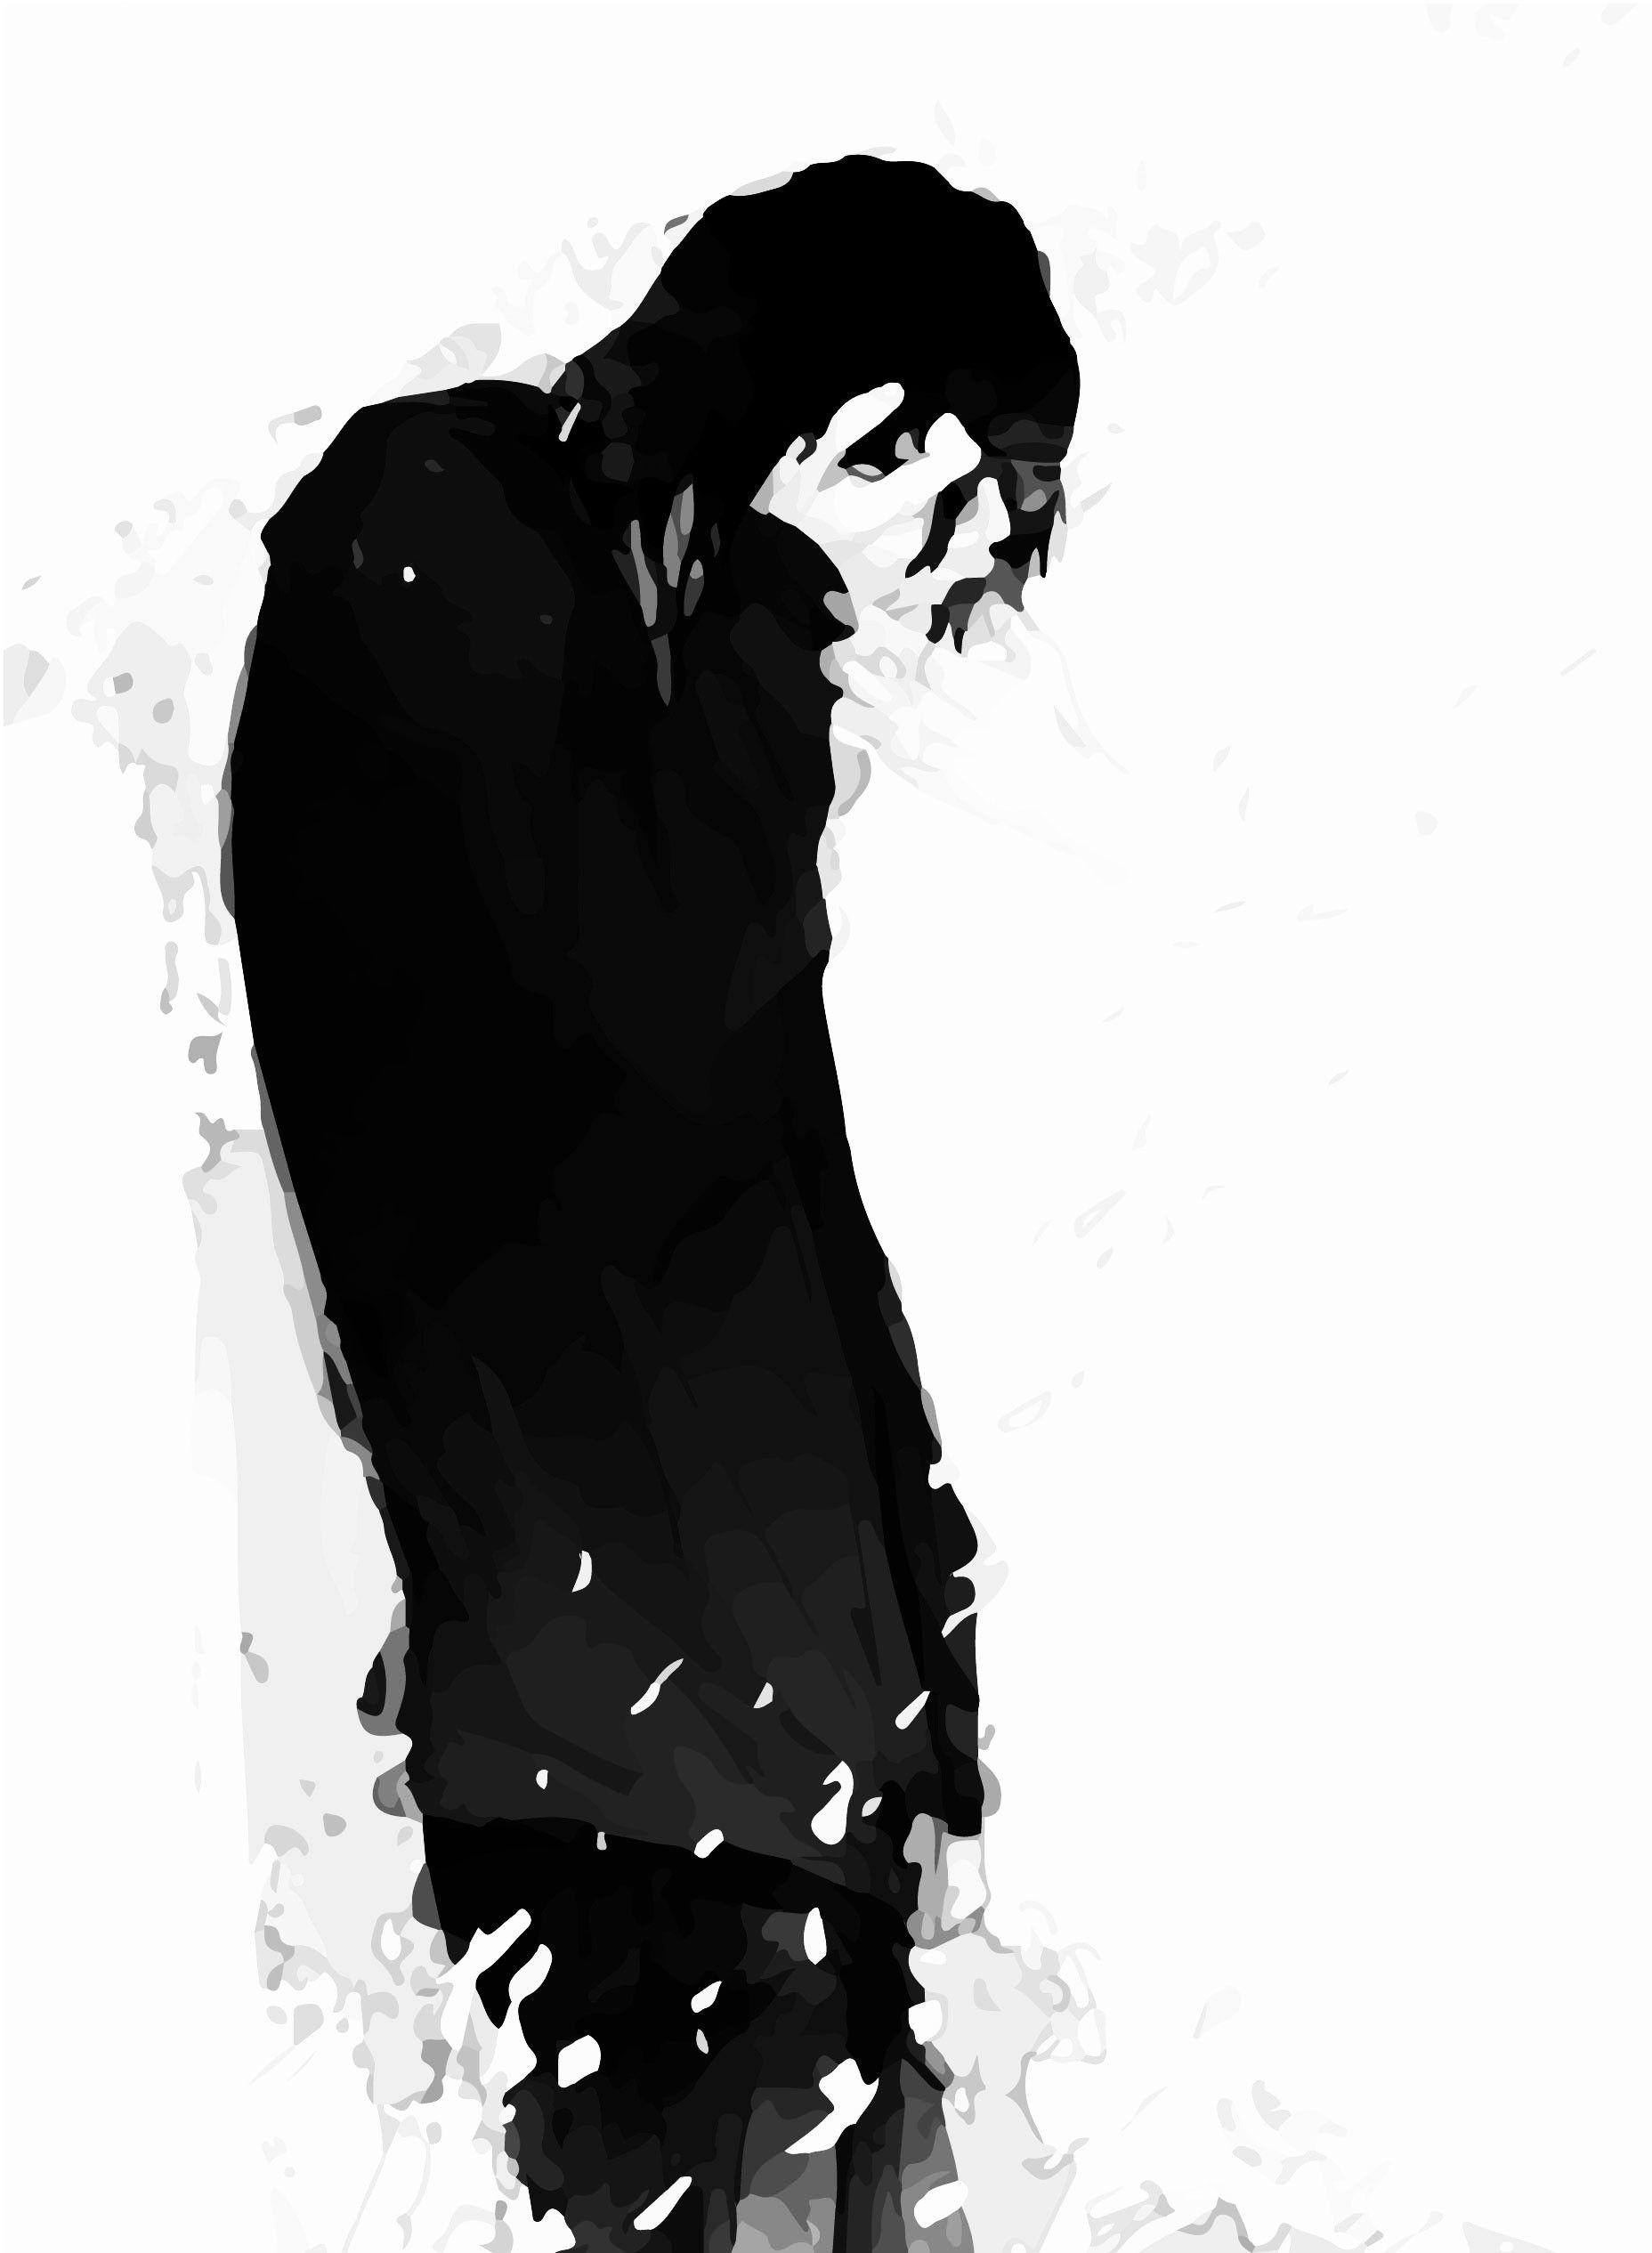 Broken Anime Boy Wallpapers Wallpaper Cave